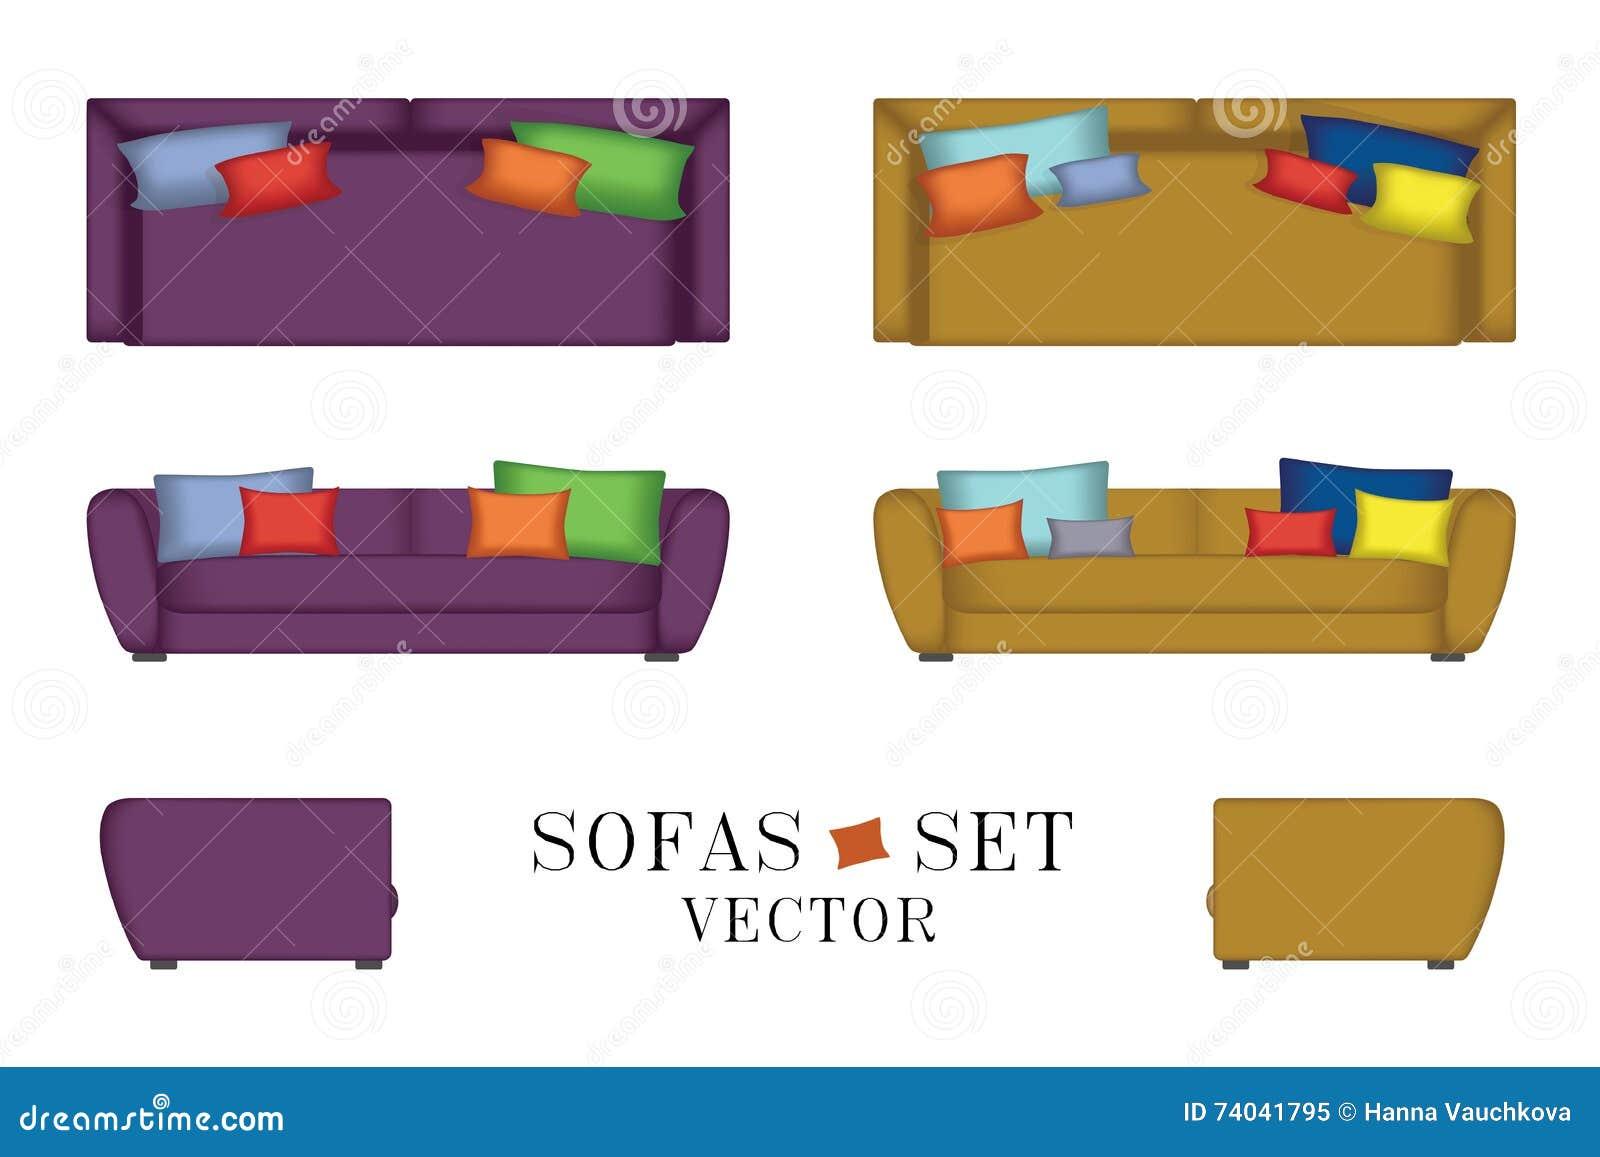 Sofas Set Furniture For Your Interior Design Vector Illustration